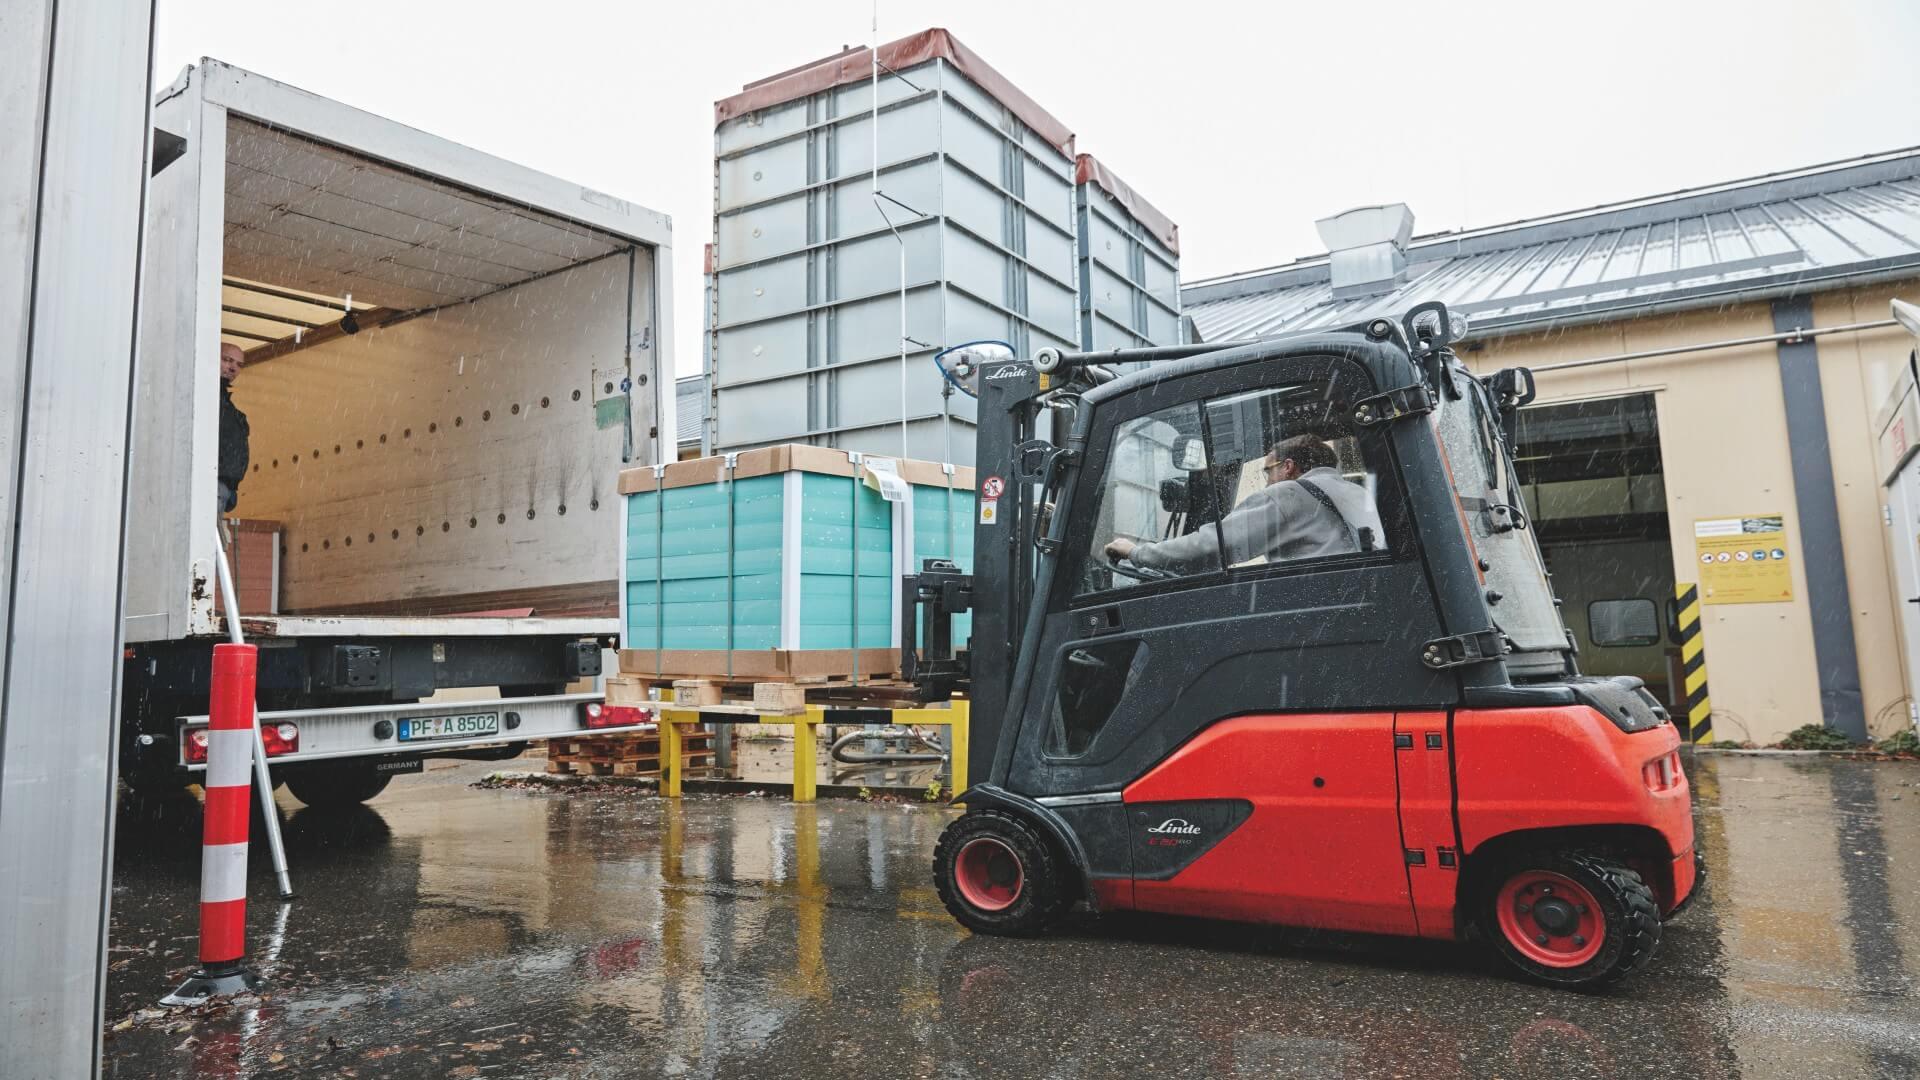 Linde electric forklift truck loading at Sika